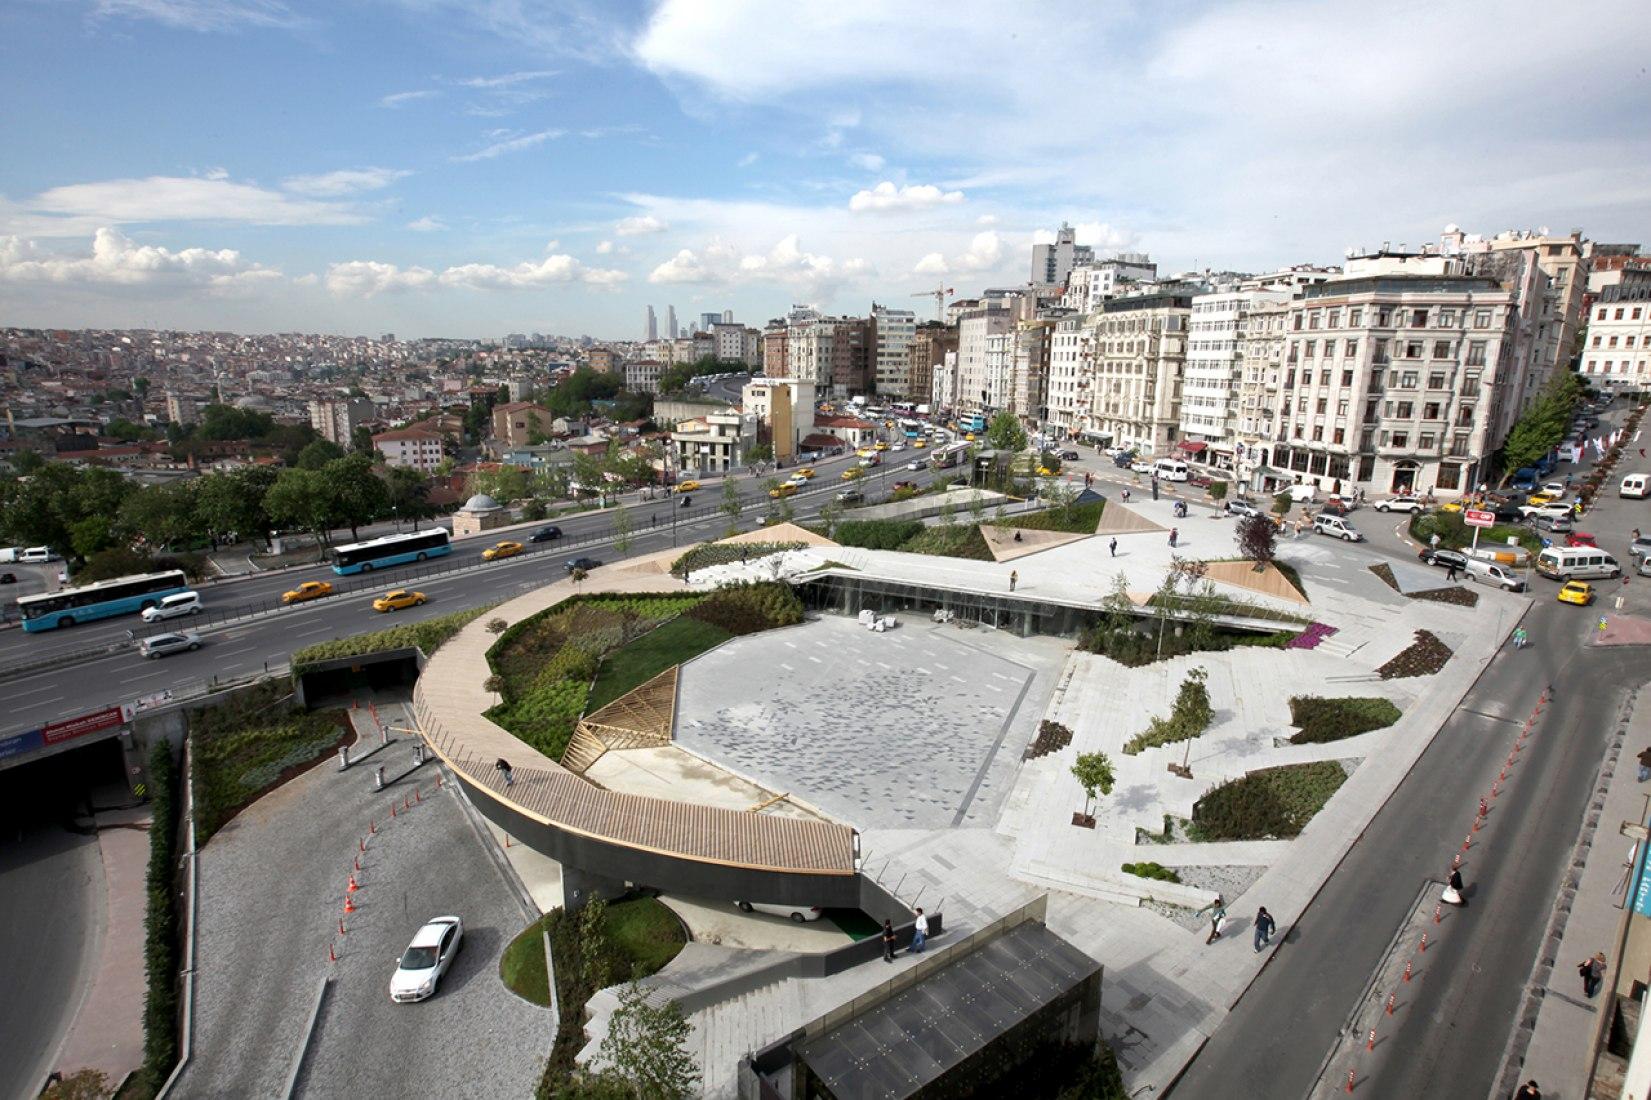 General view. Parque Şişhane, Estambul, por SANALarc. FotogŞişhane Park, Istanbul, by SANALarc. Photography © SANAL architecture | urbanism.